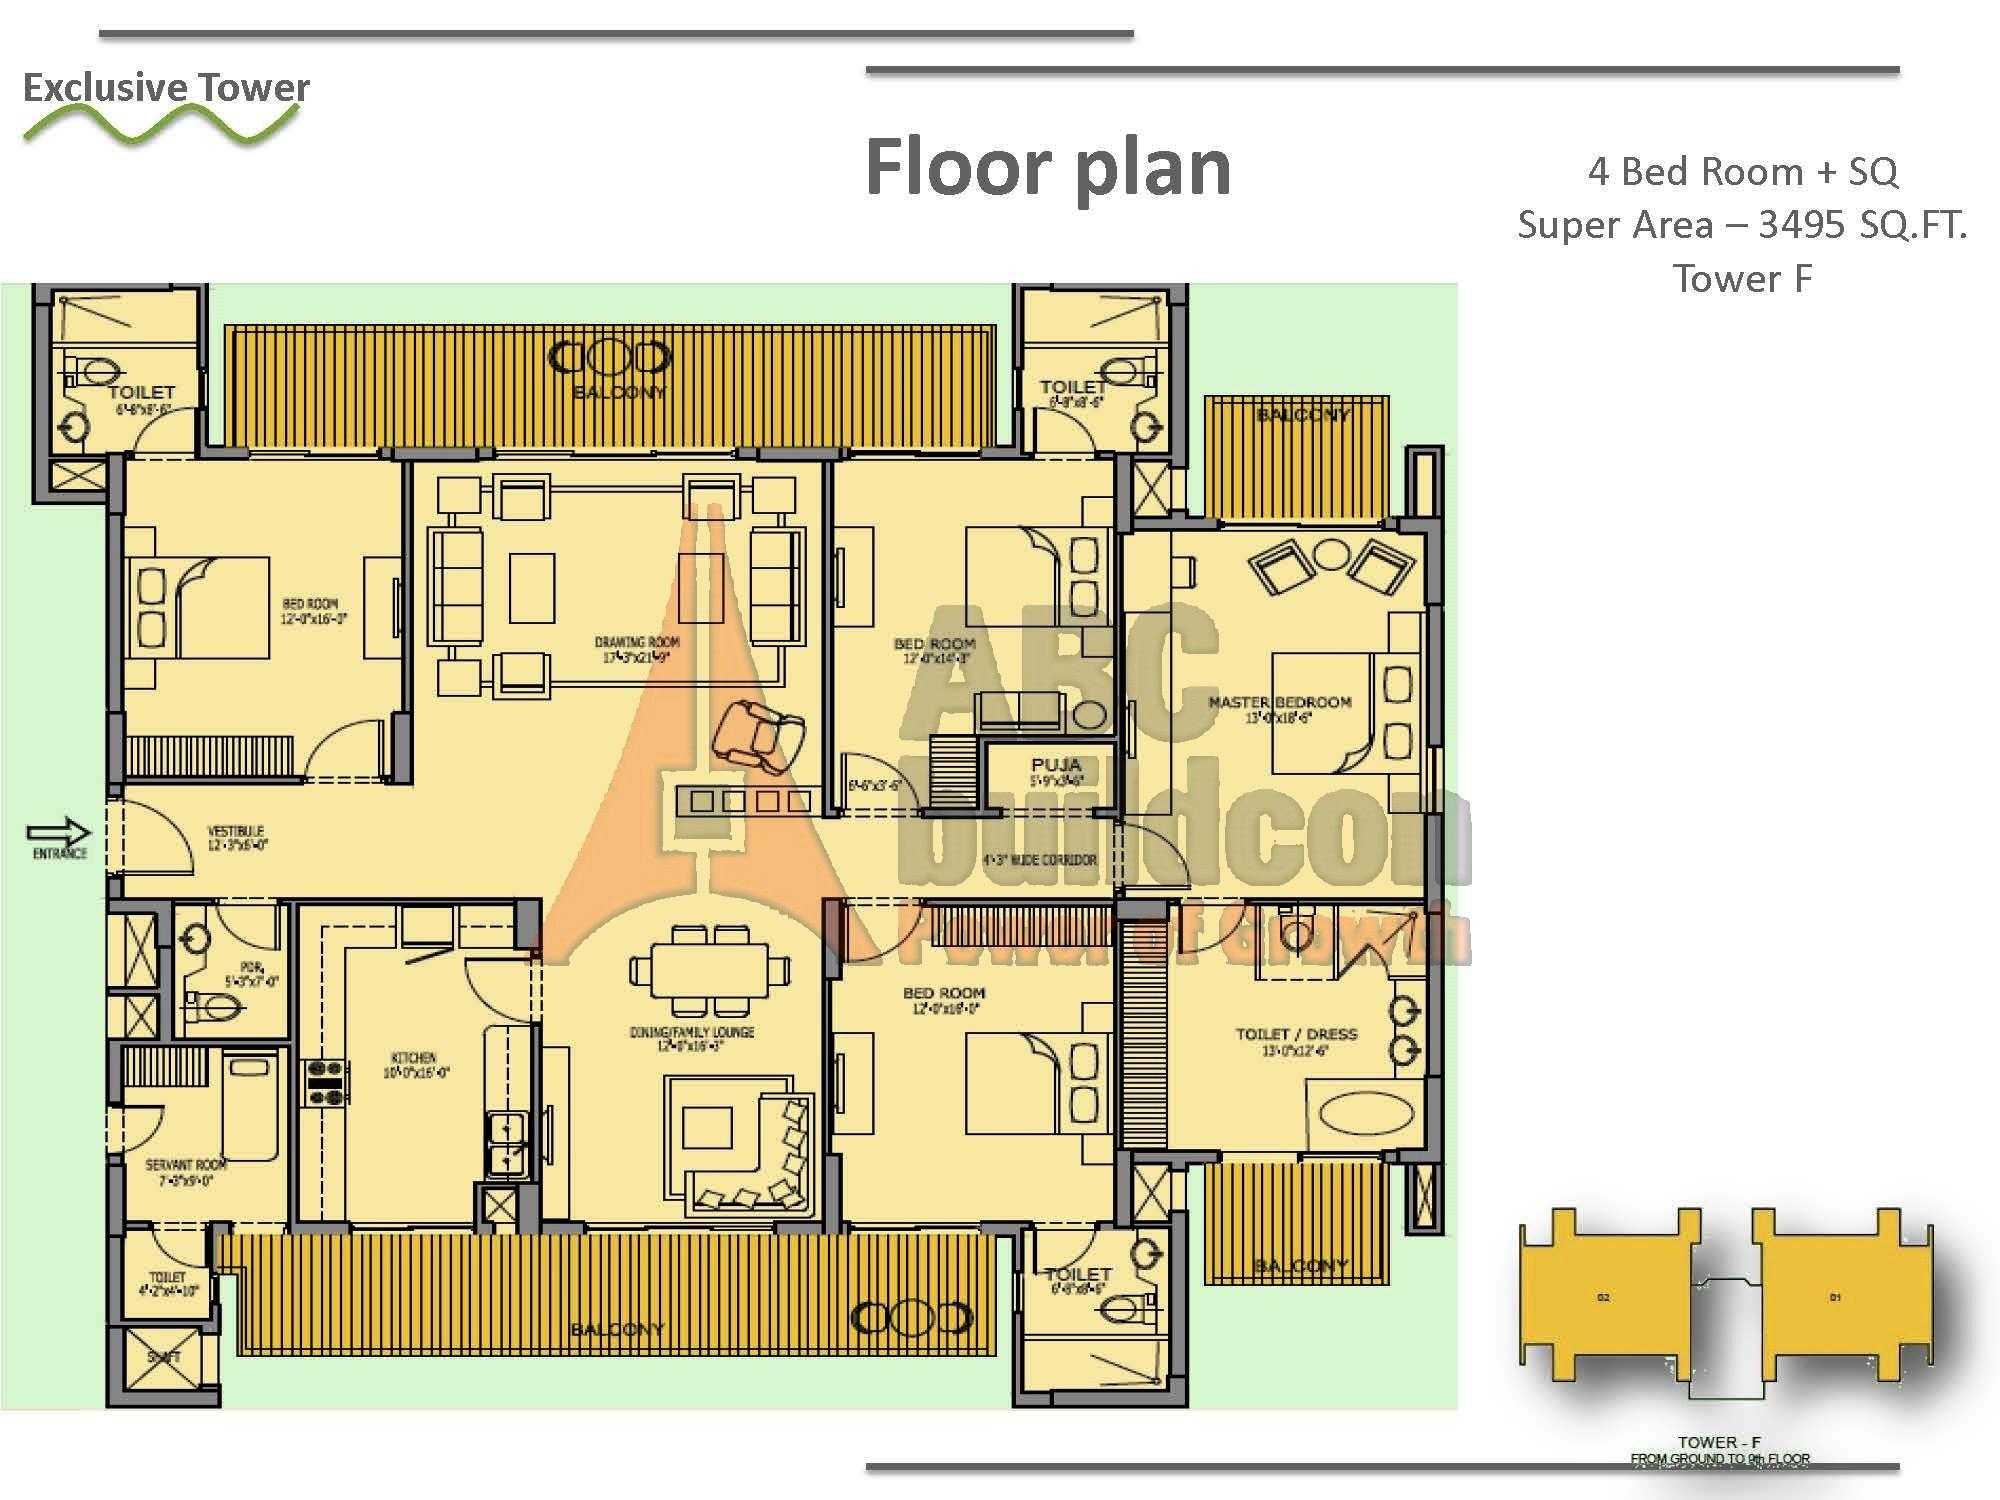 Bestech Park View Spa Floor Plan